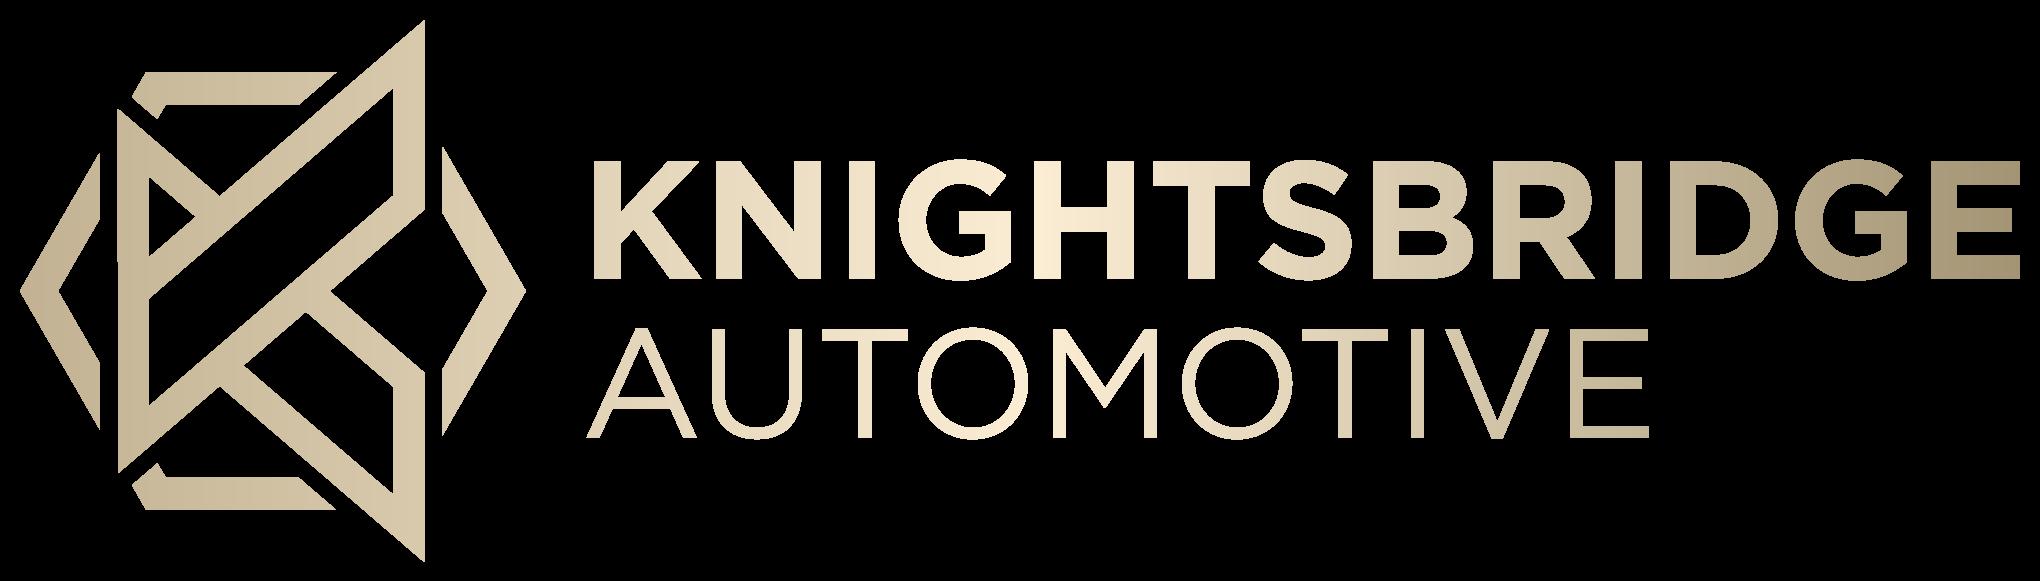 Knightsbridge Automotive